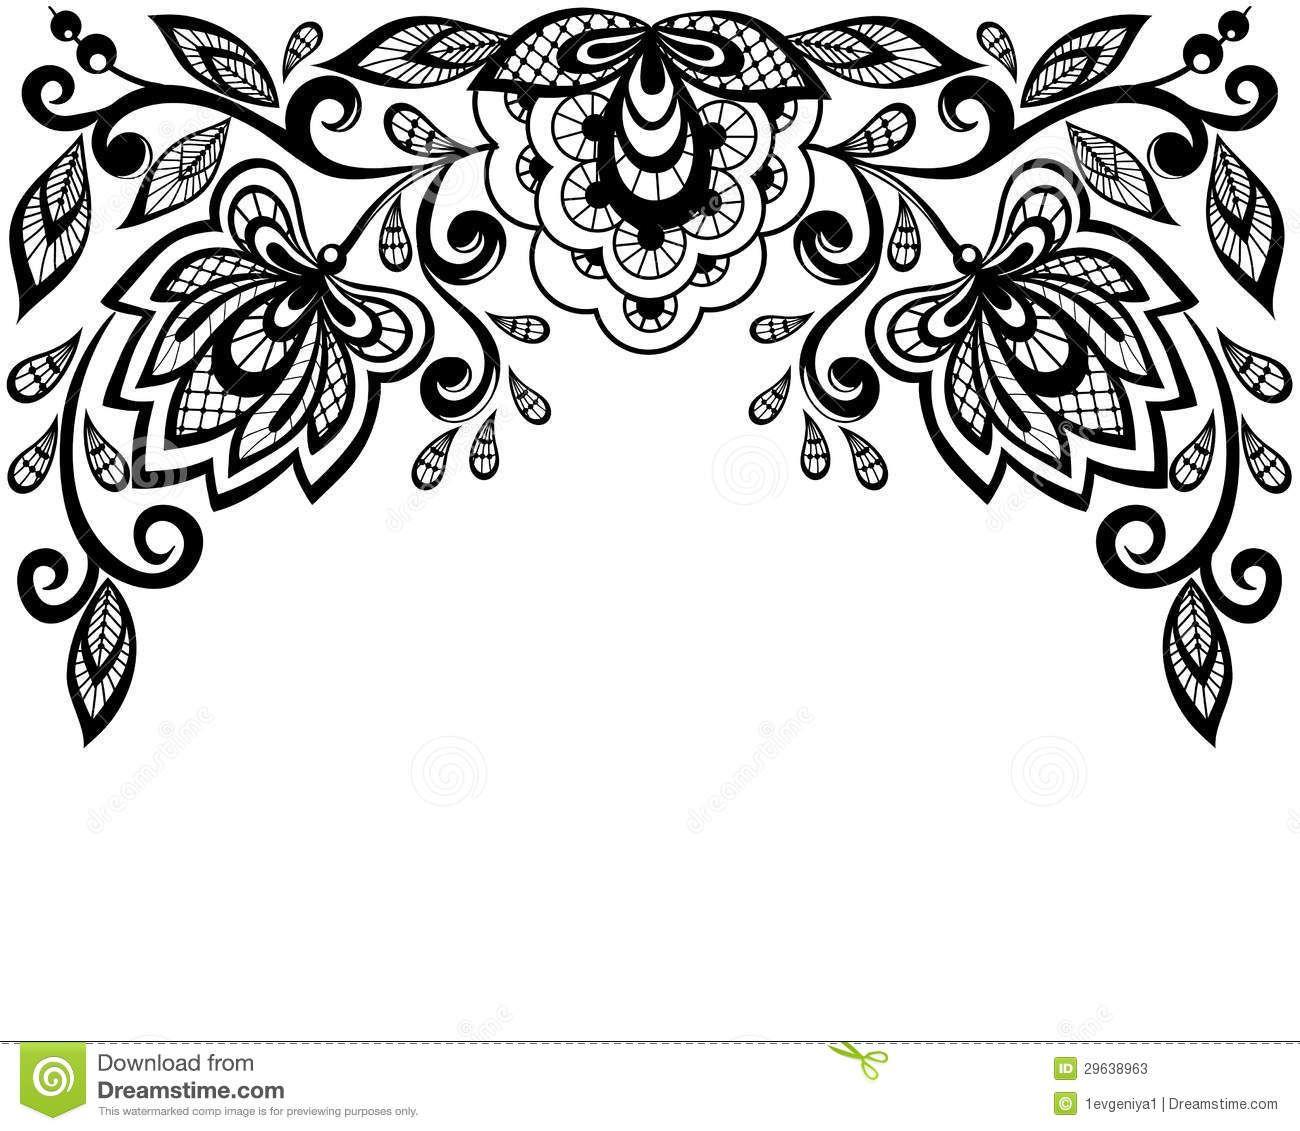 Background White Border Borders And Black Frames Black Clip Diamond Art